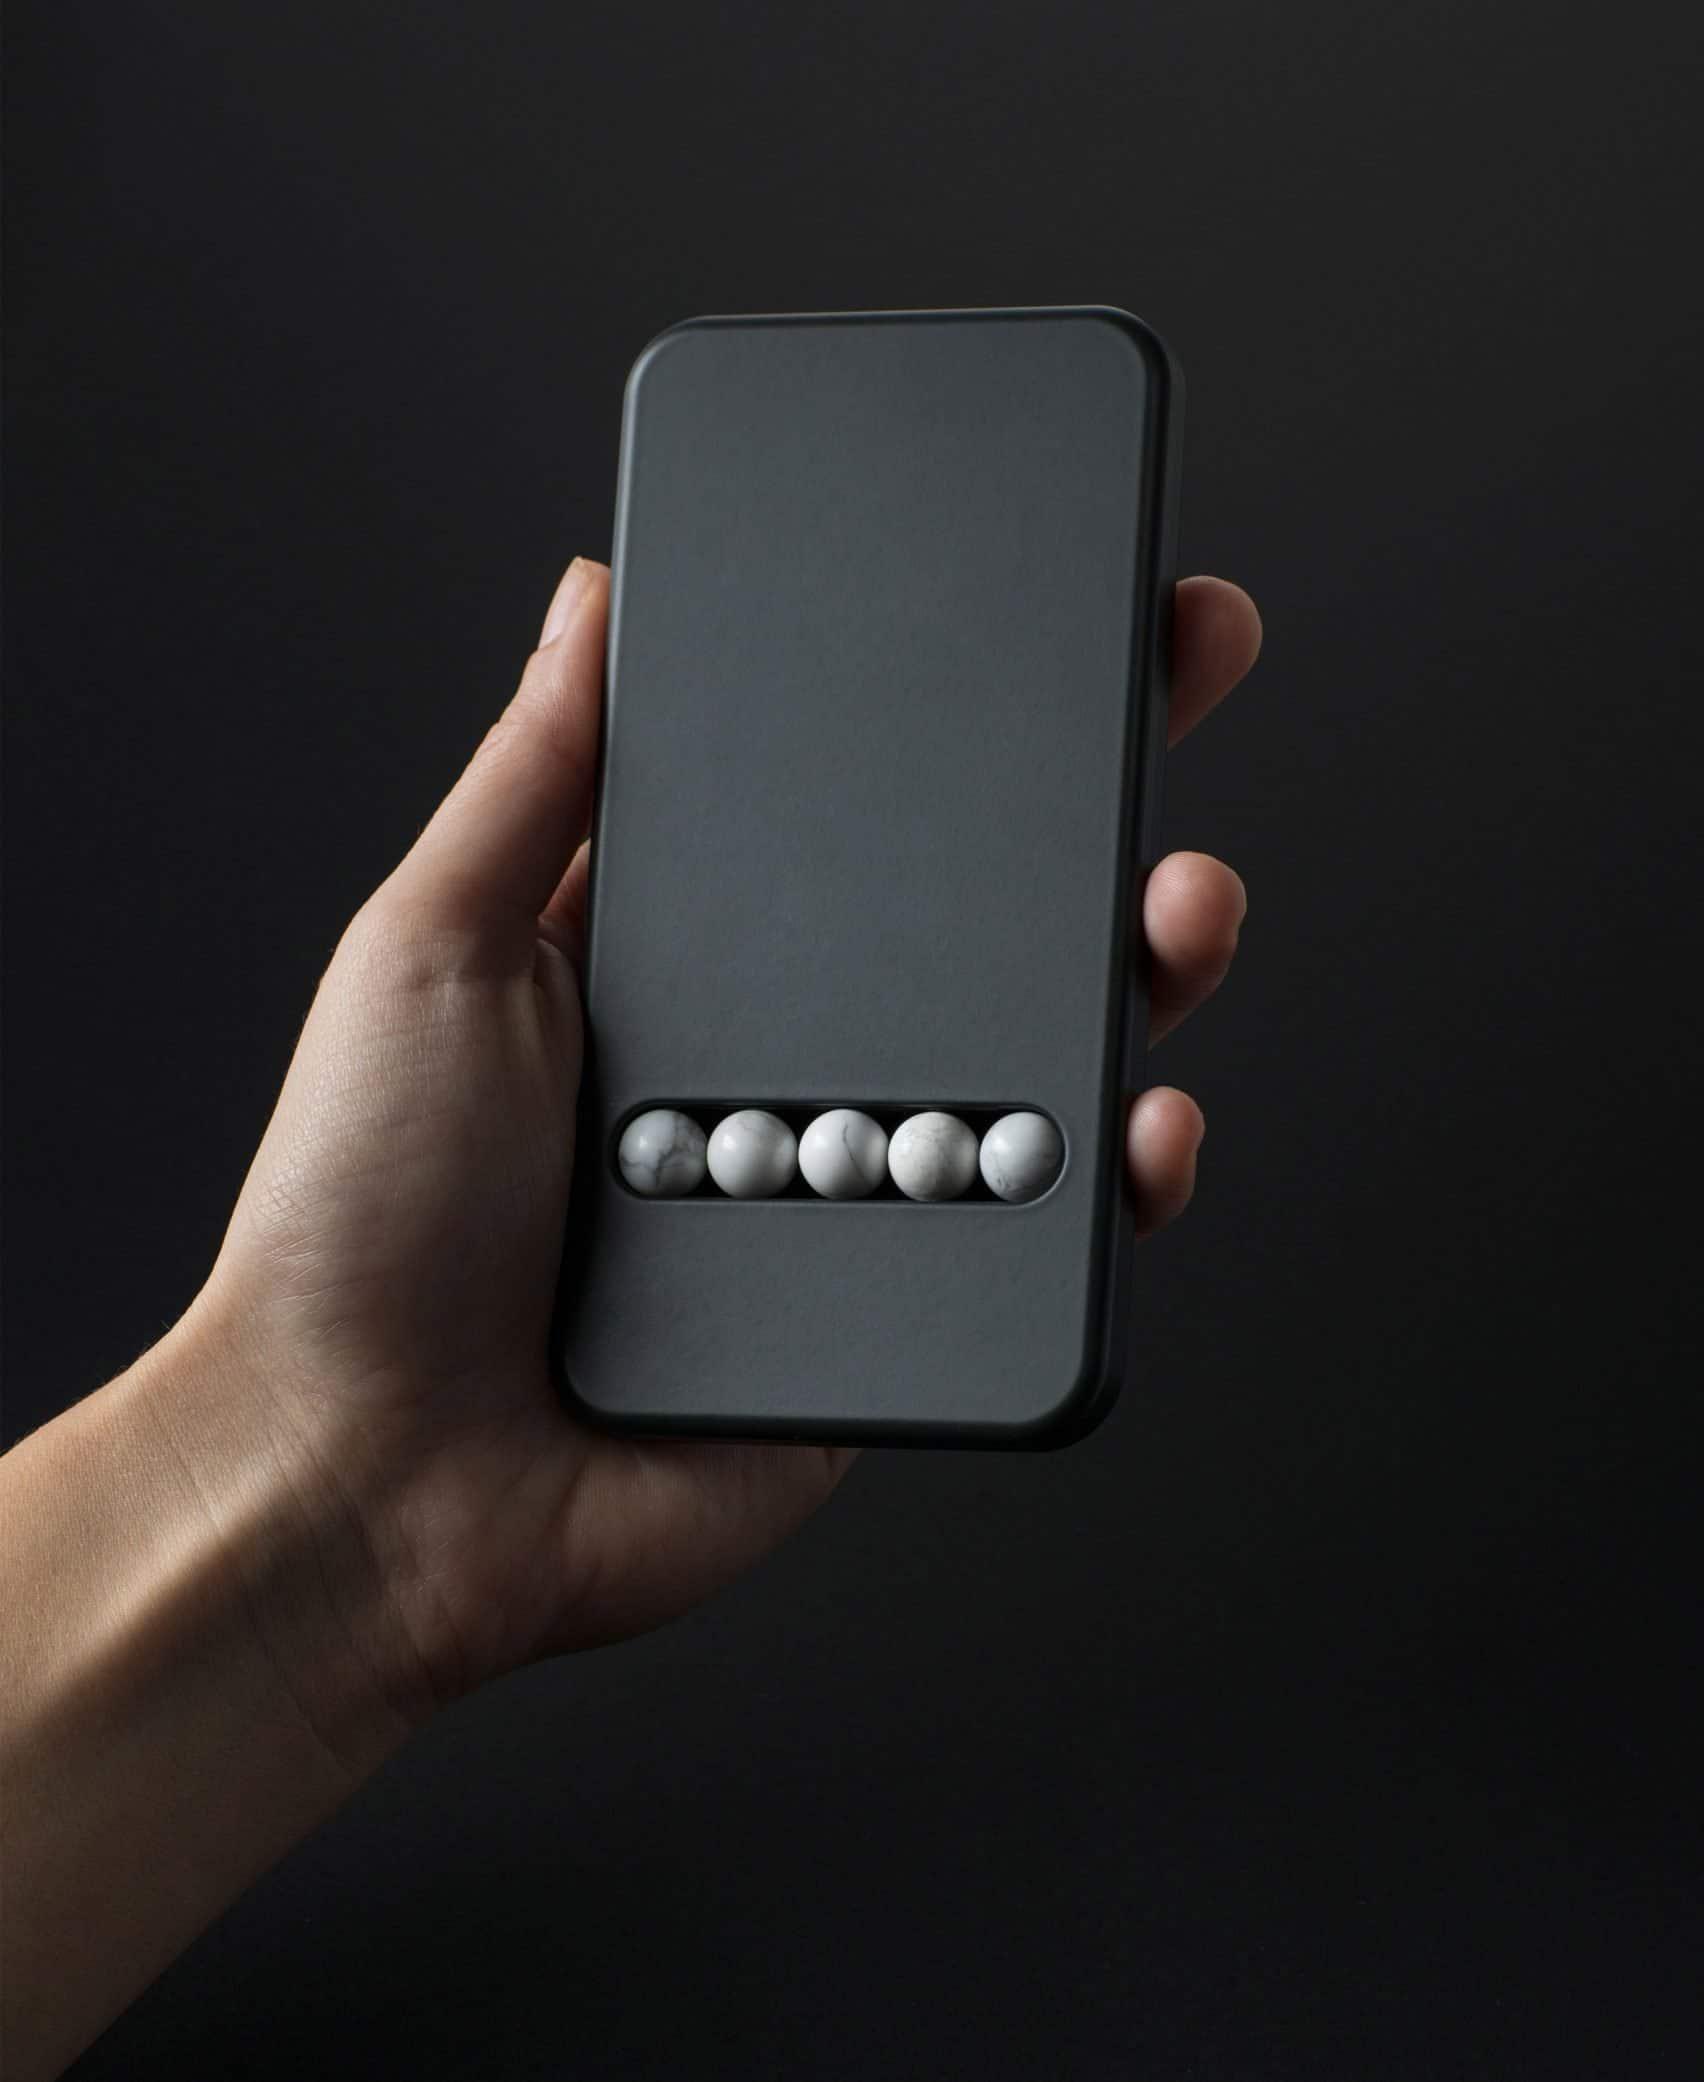 phone for fiddling